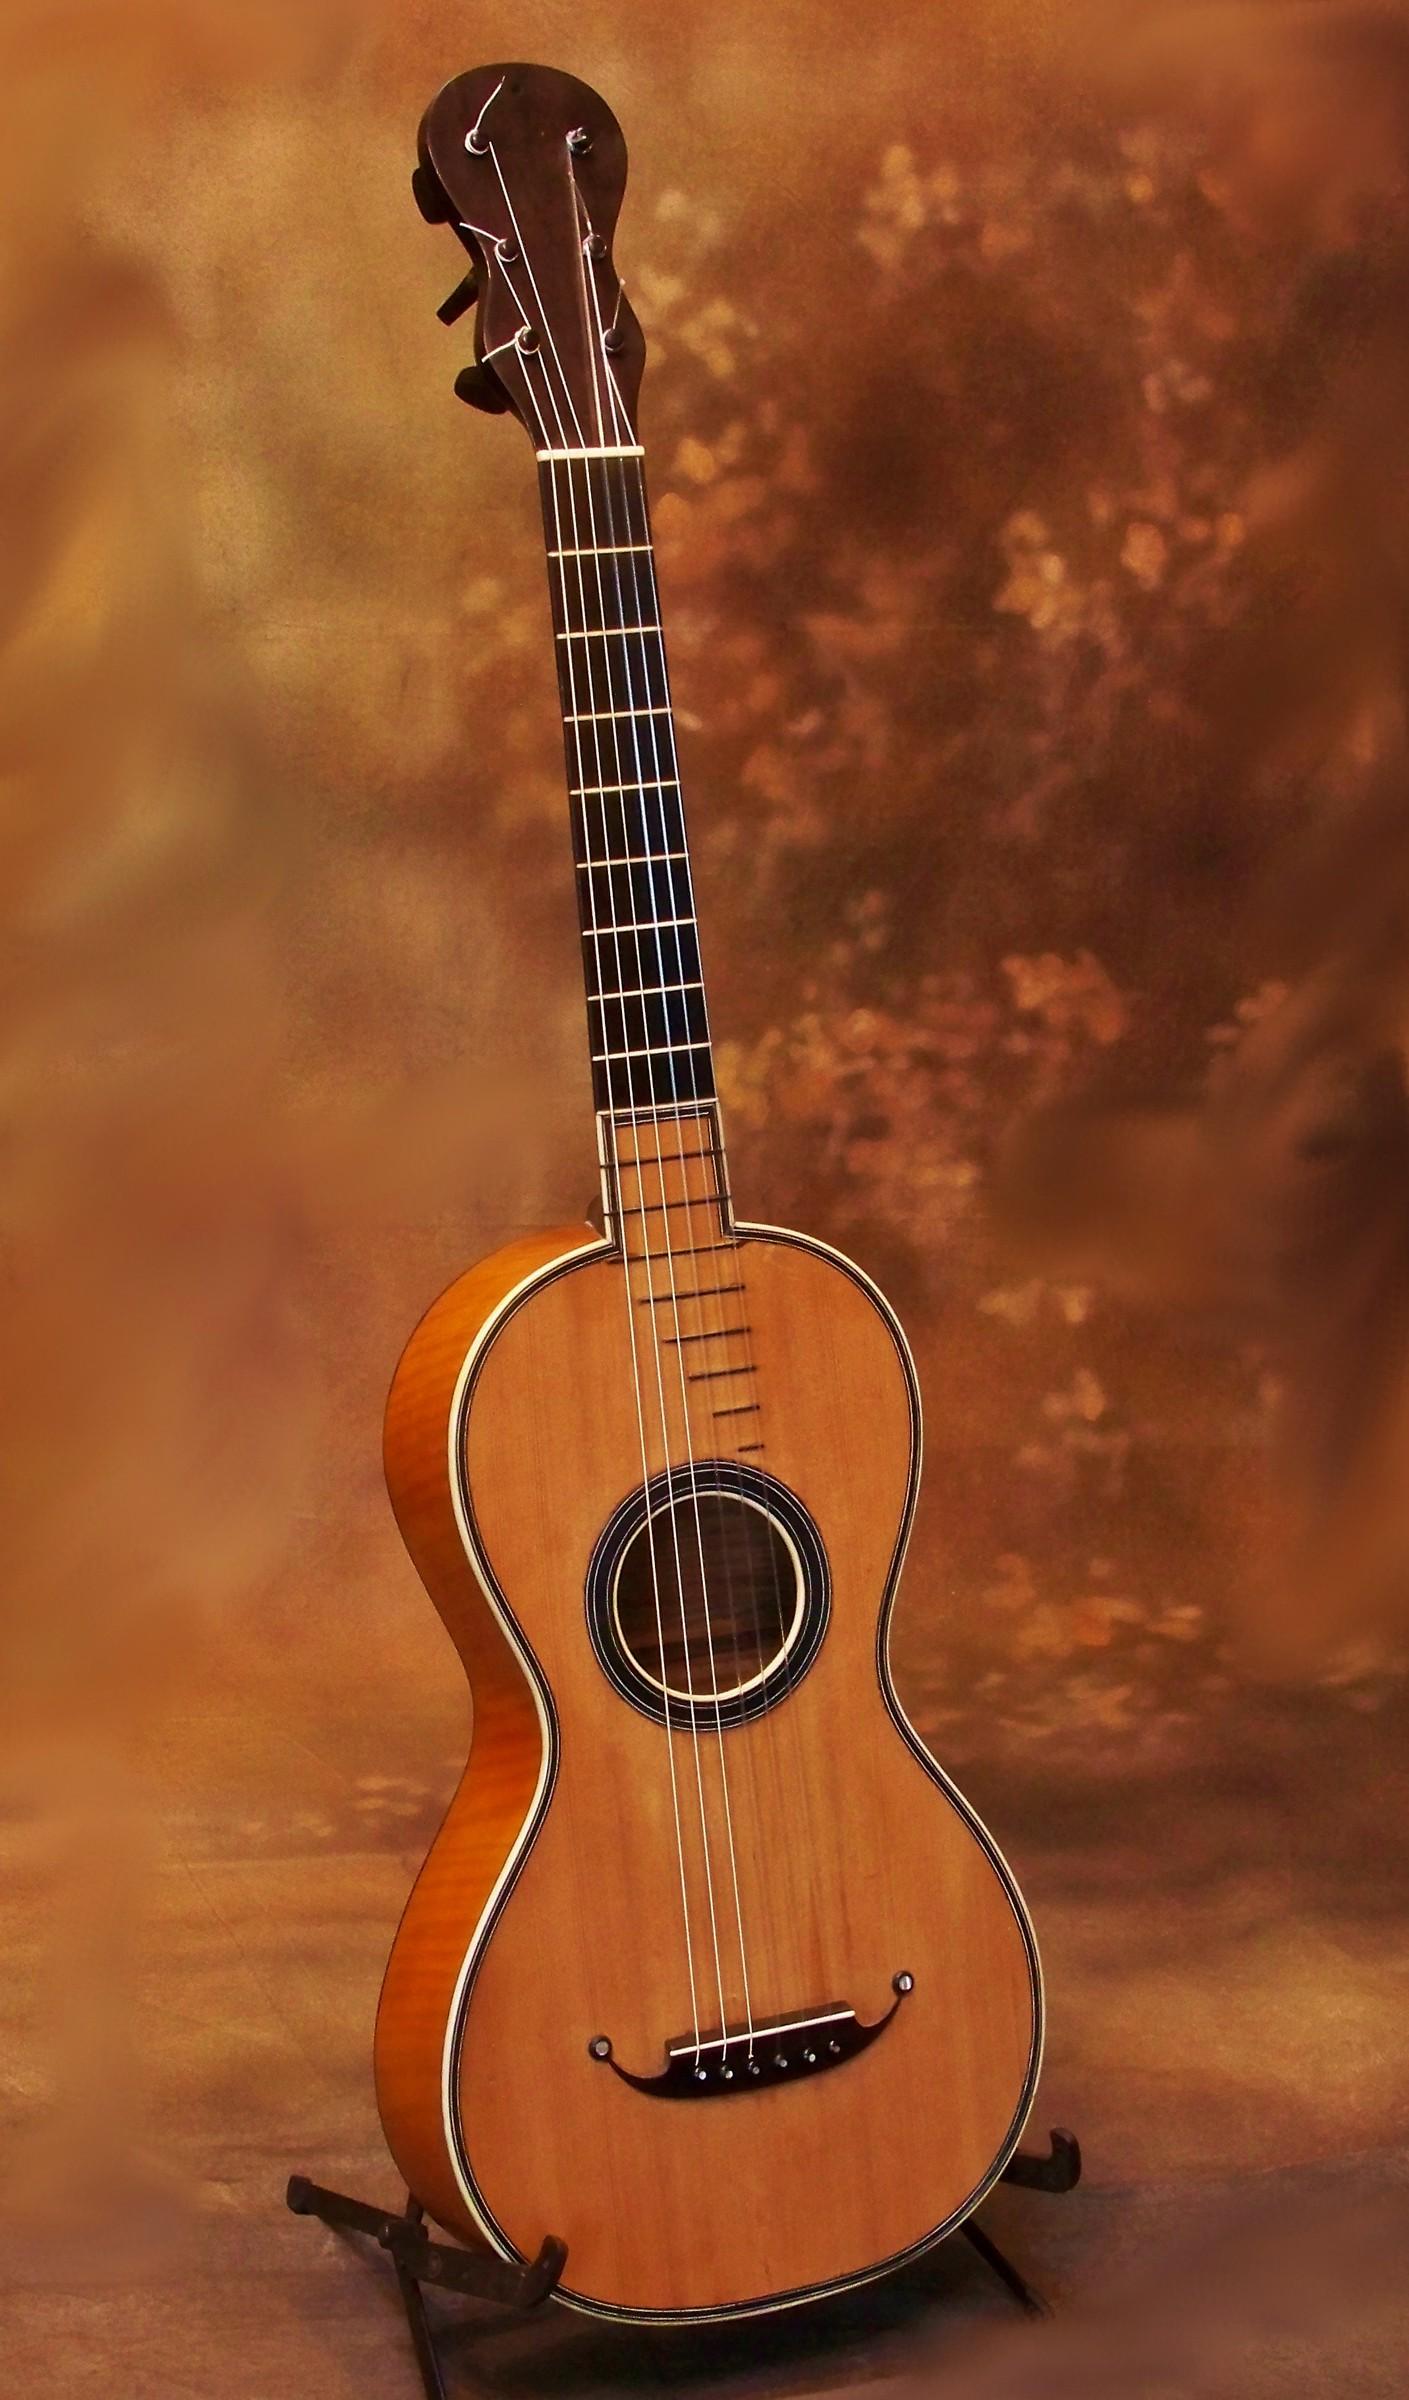 Appraisals - Savage Classical Guitar